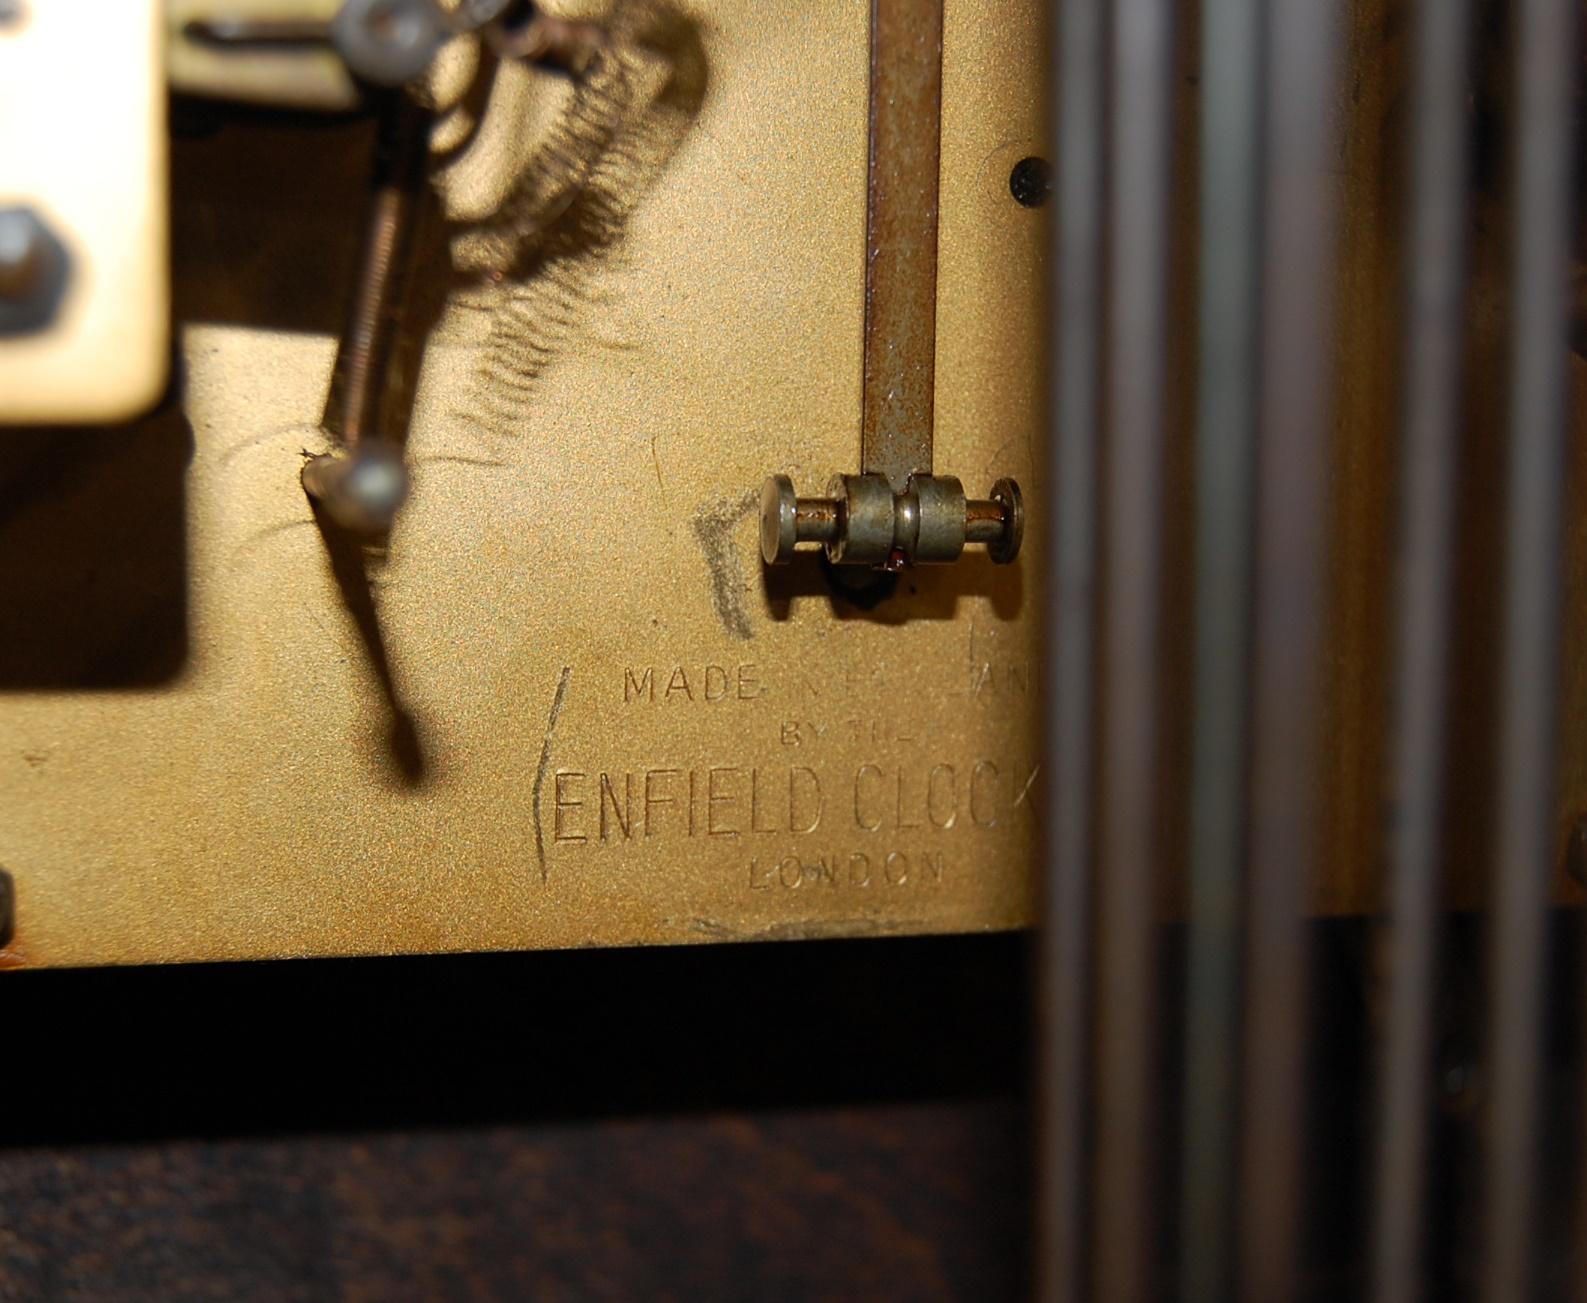 EARLY 20TH CENTURY 1930S WALNUT VENEER 8 DAY GRANDMOTHER CLOCK - Image 7 of 8